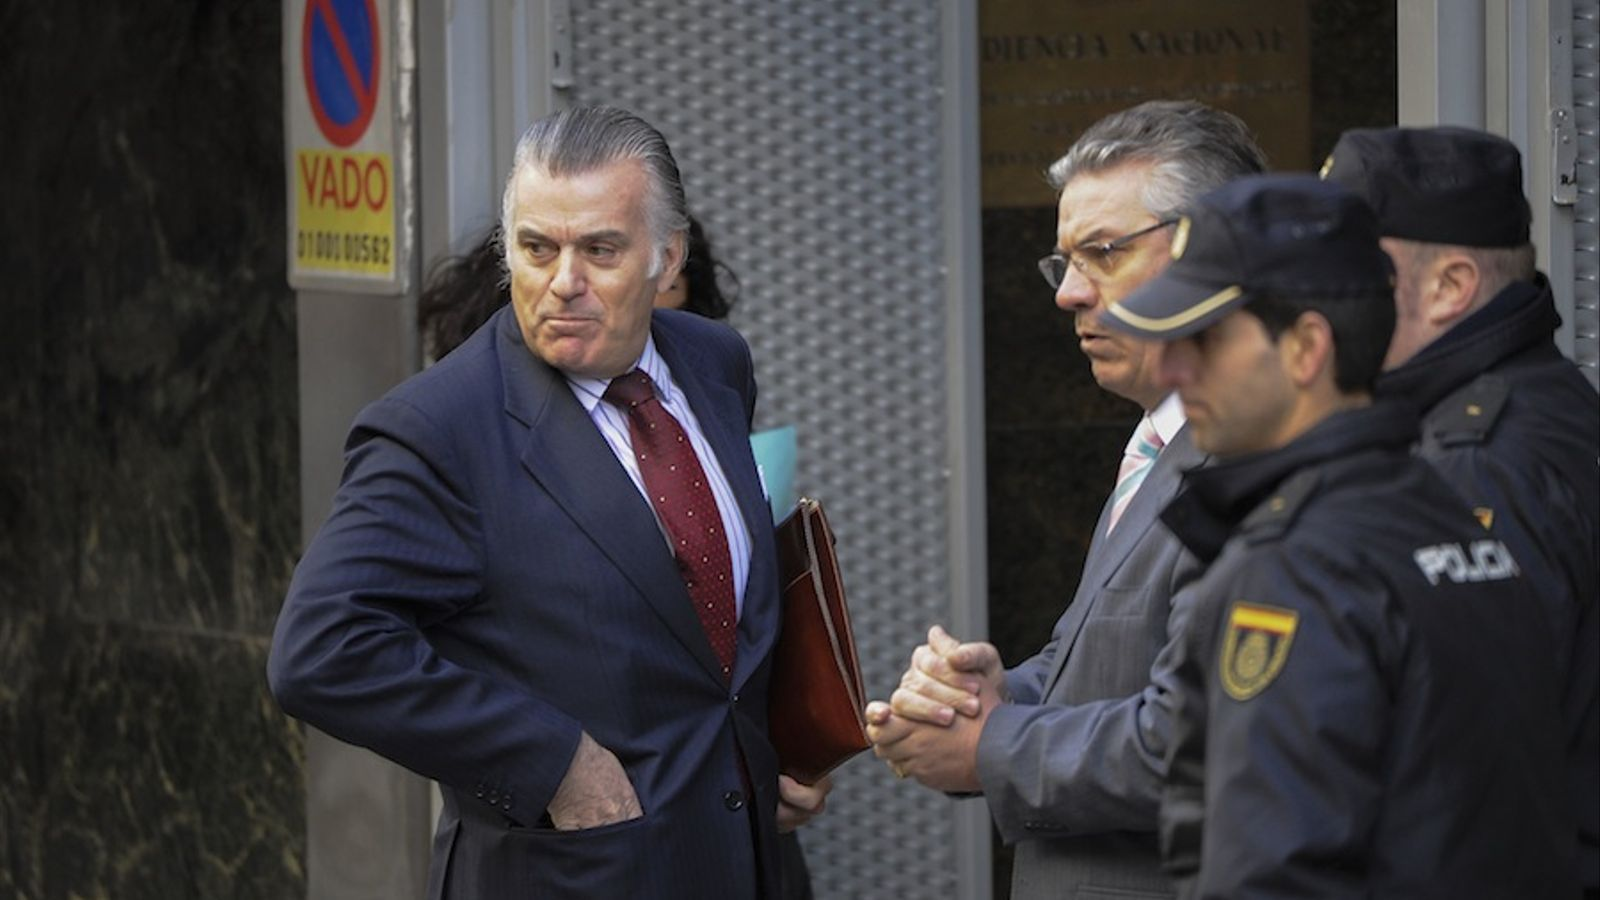 Luis Bárcenas arriba a l'Audiència Nacional / AFP